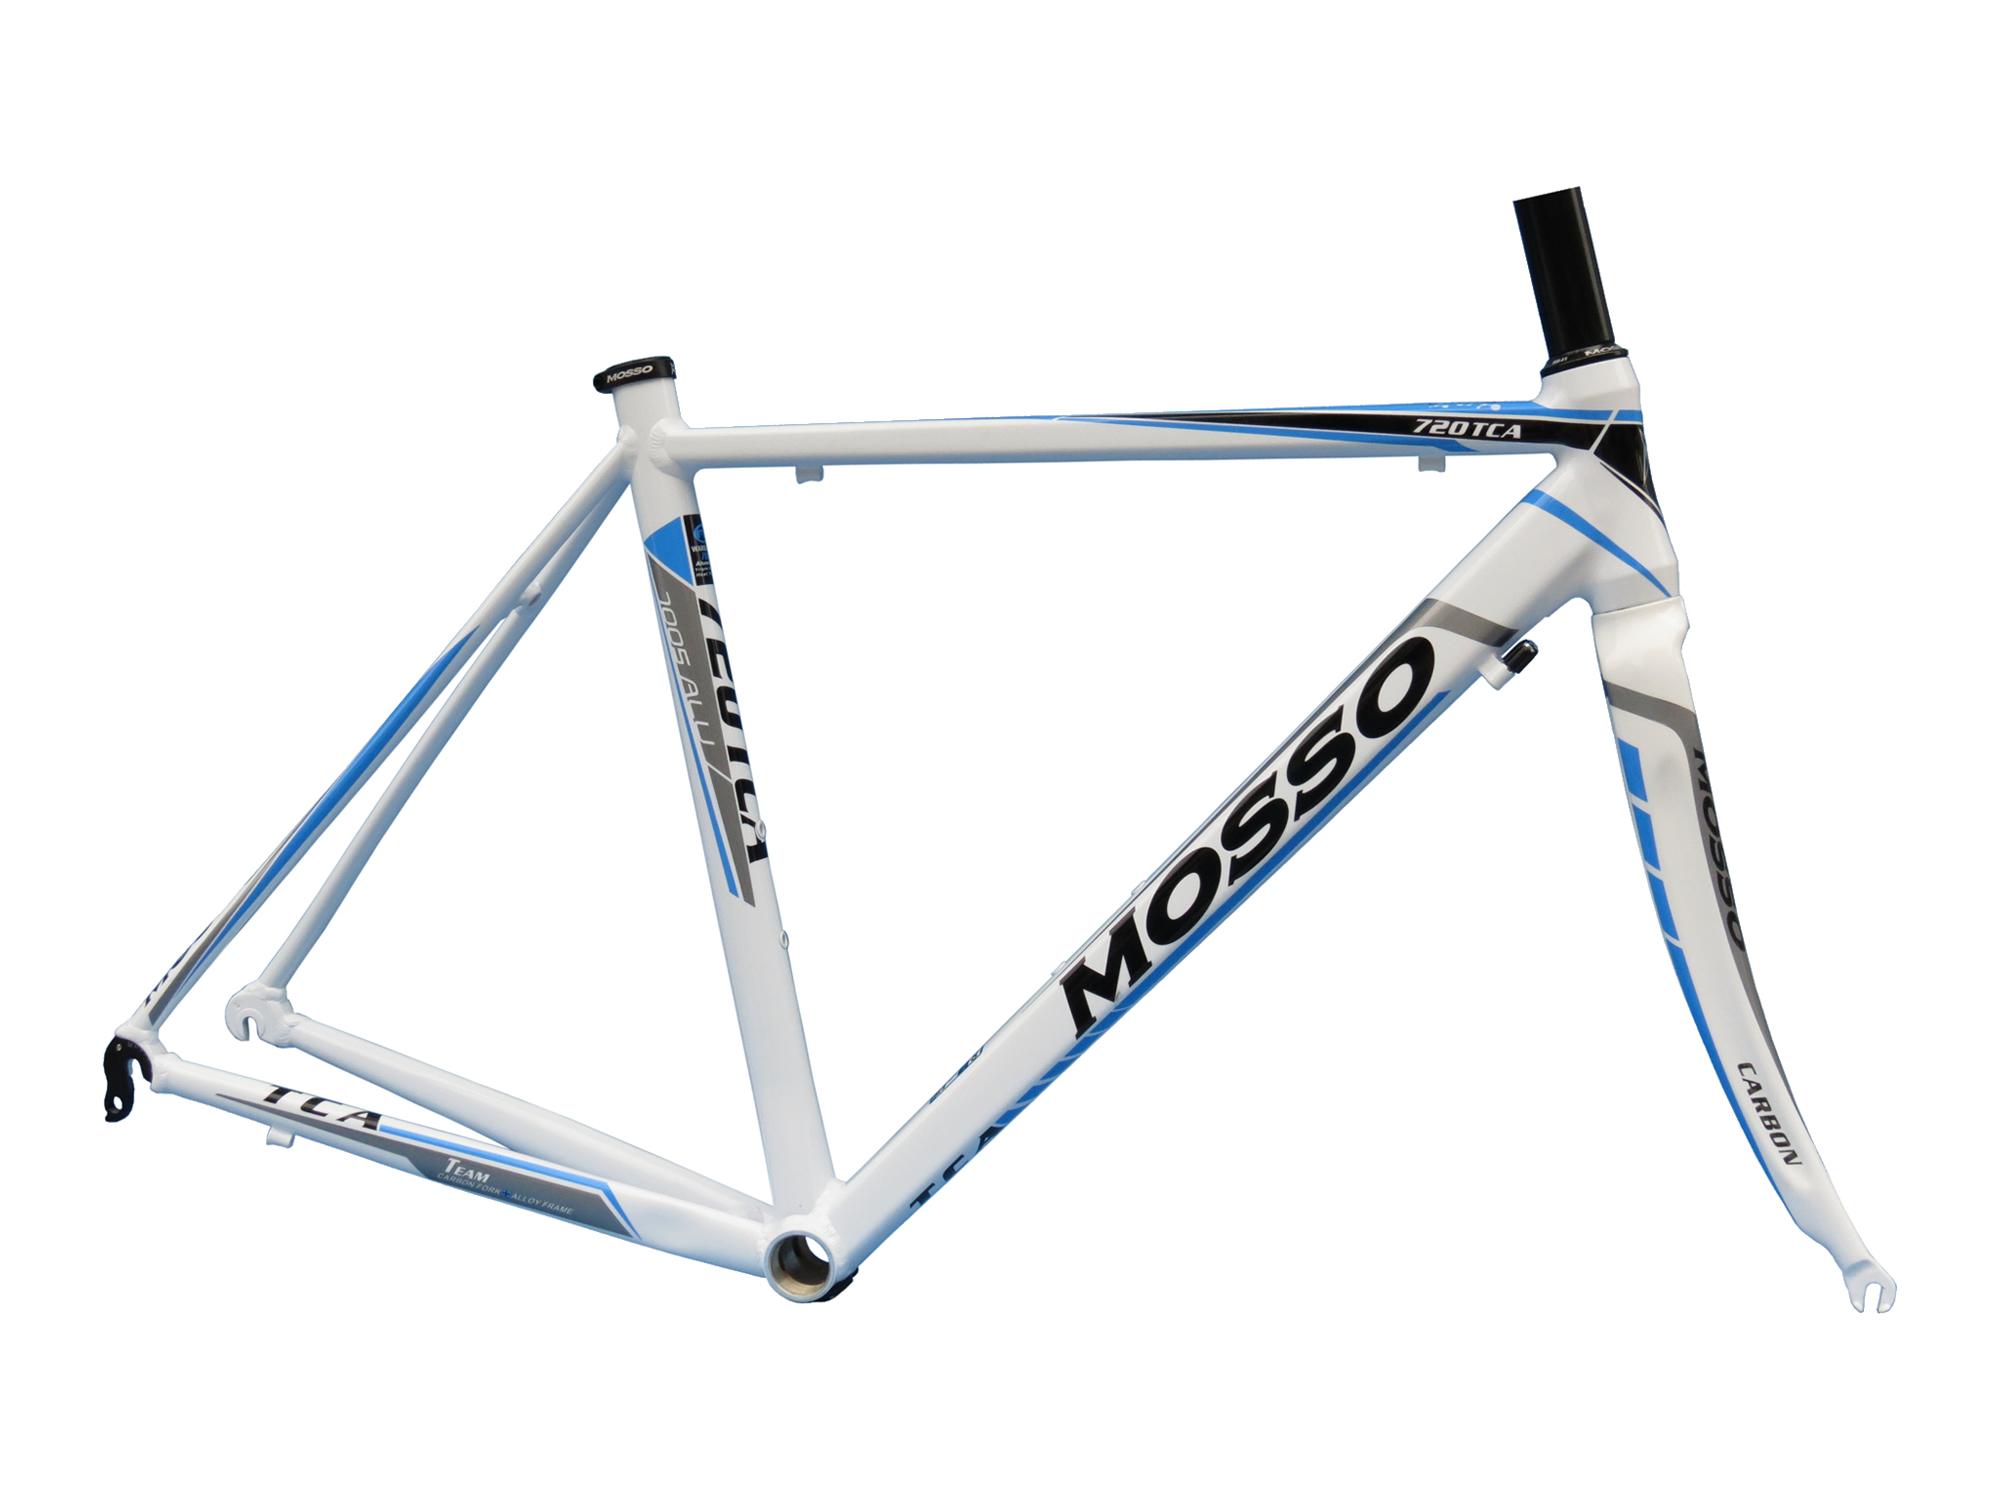 Mosso Bike Professional Frame Manufacture 669 Xc Pro